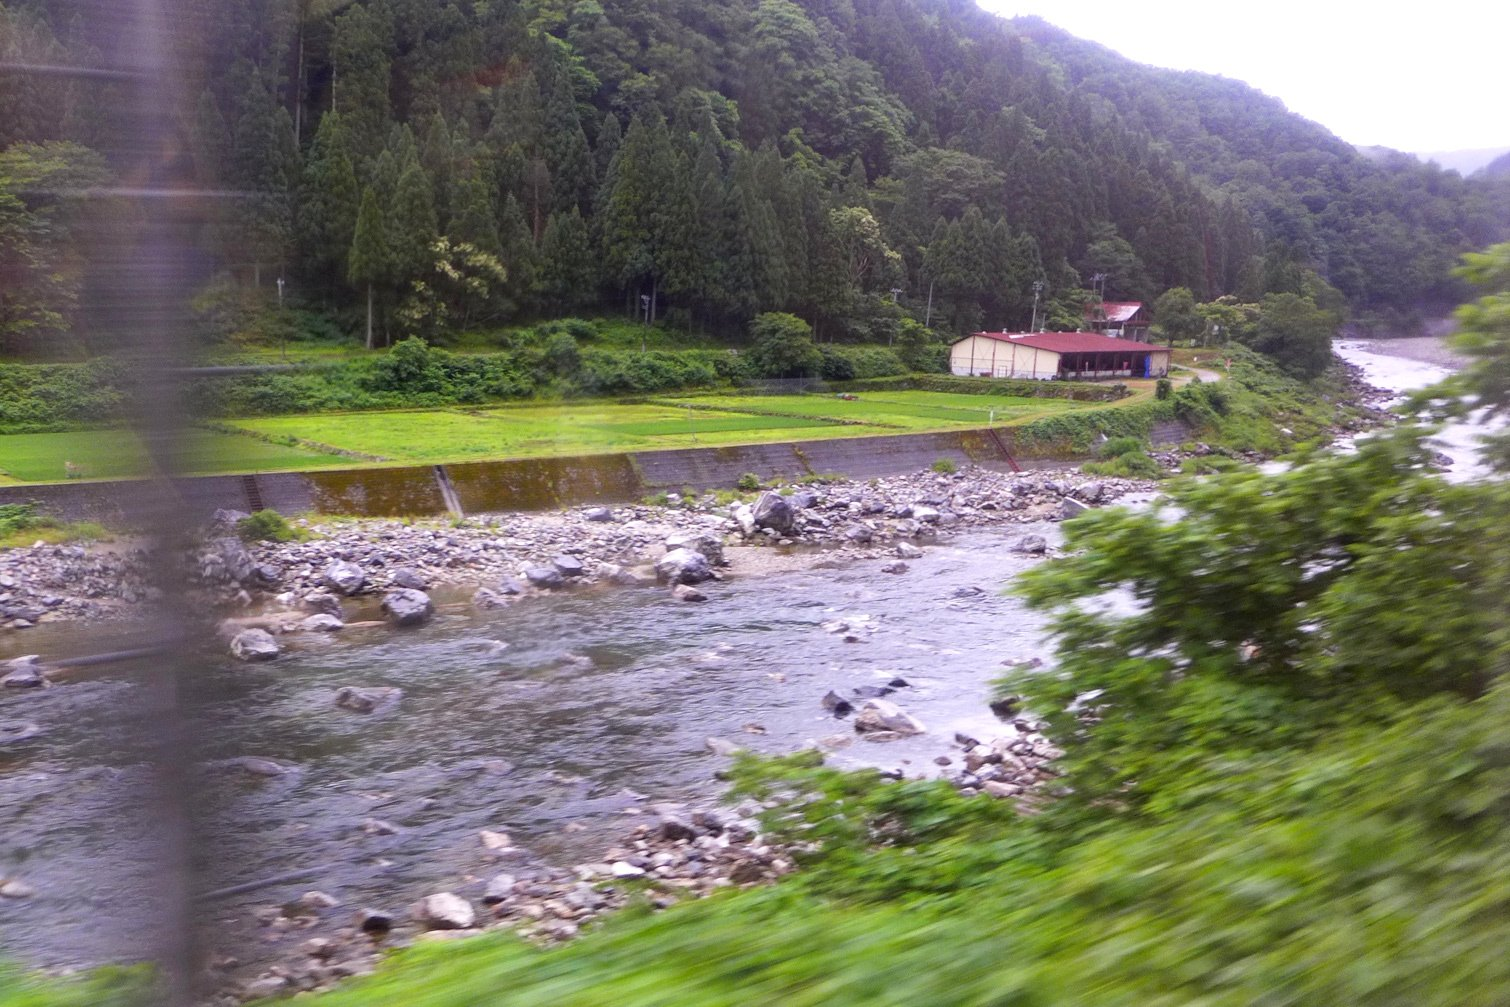 Toyama Japan travel; Hida View Limited Express Japan; Train Travel Japan Alps; D.I.Y. Japan itinerary